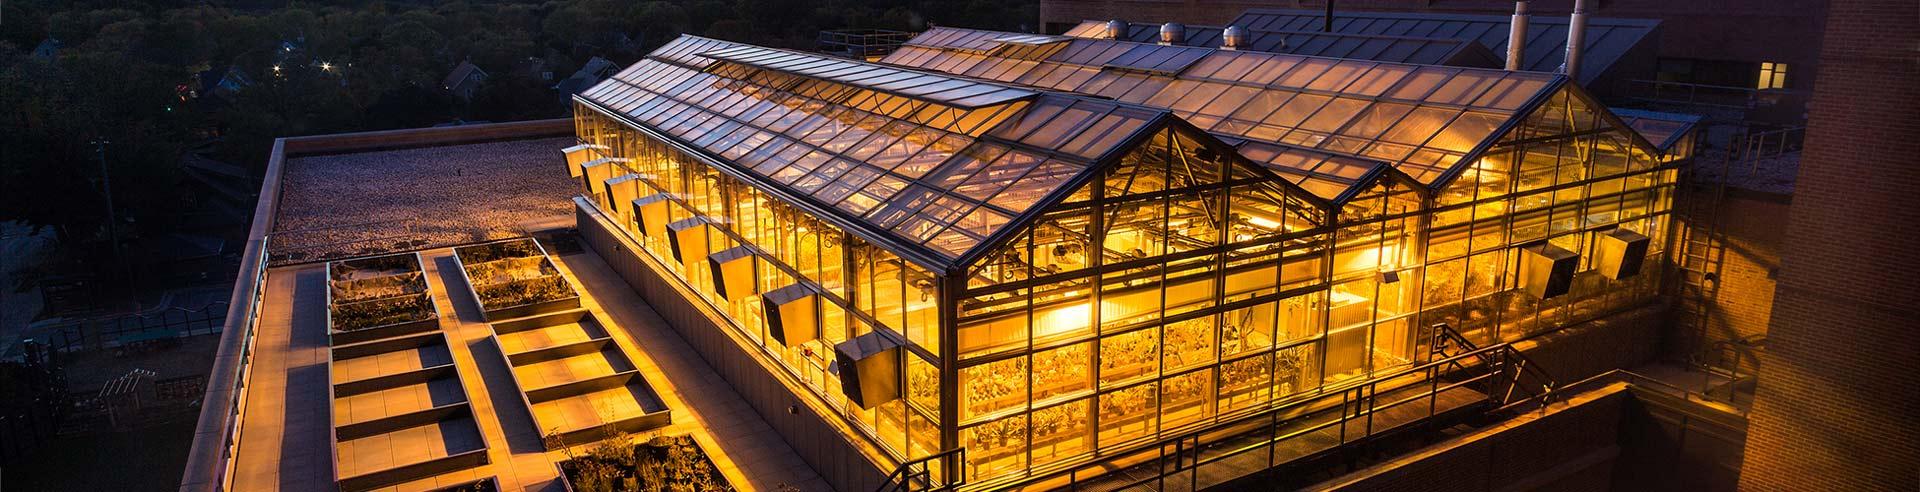 UWM Greenhouse